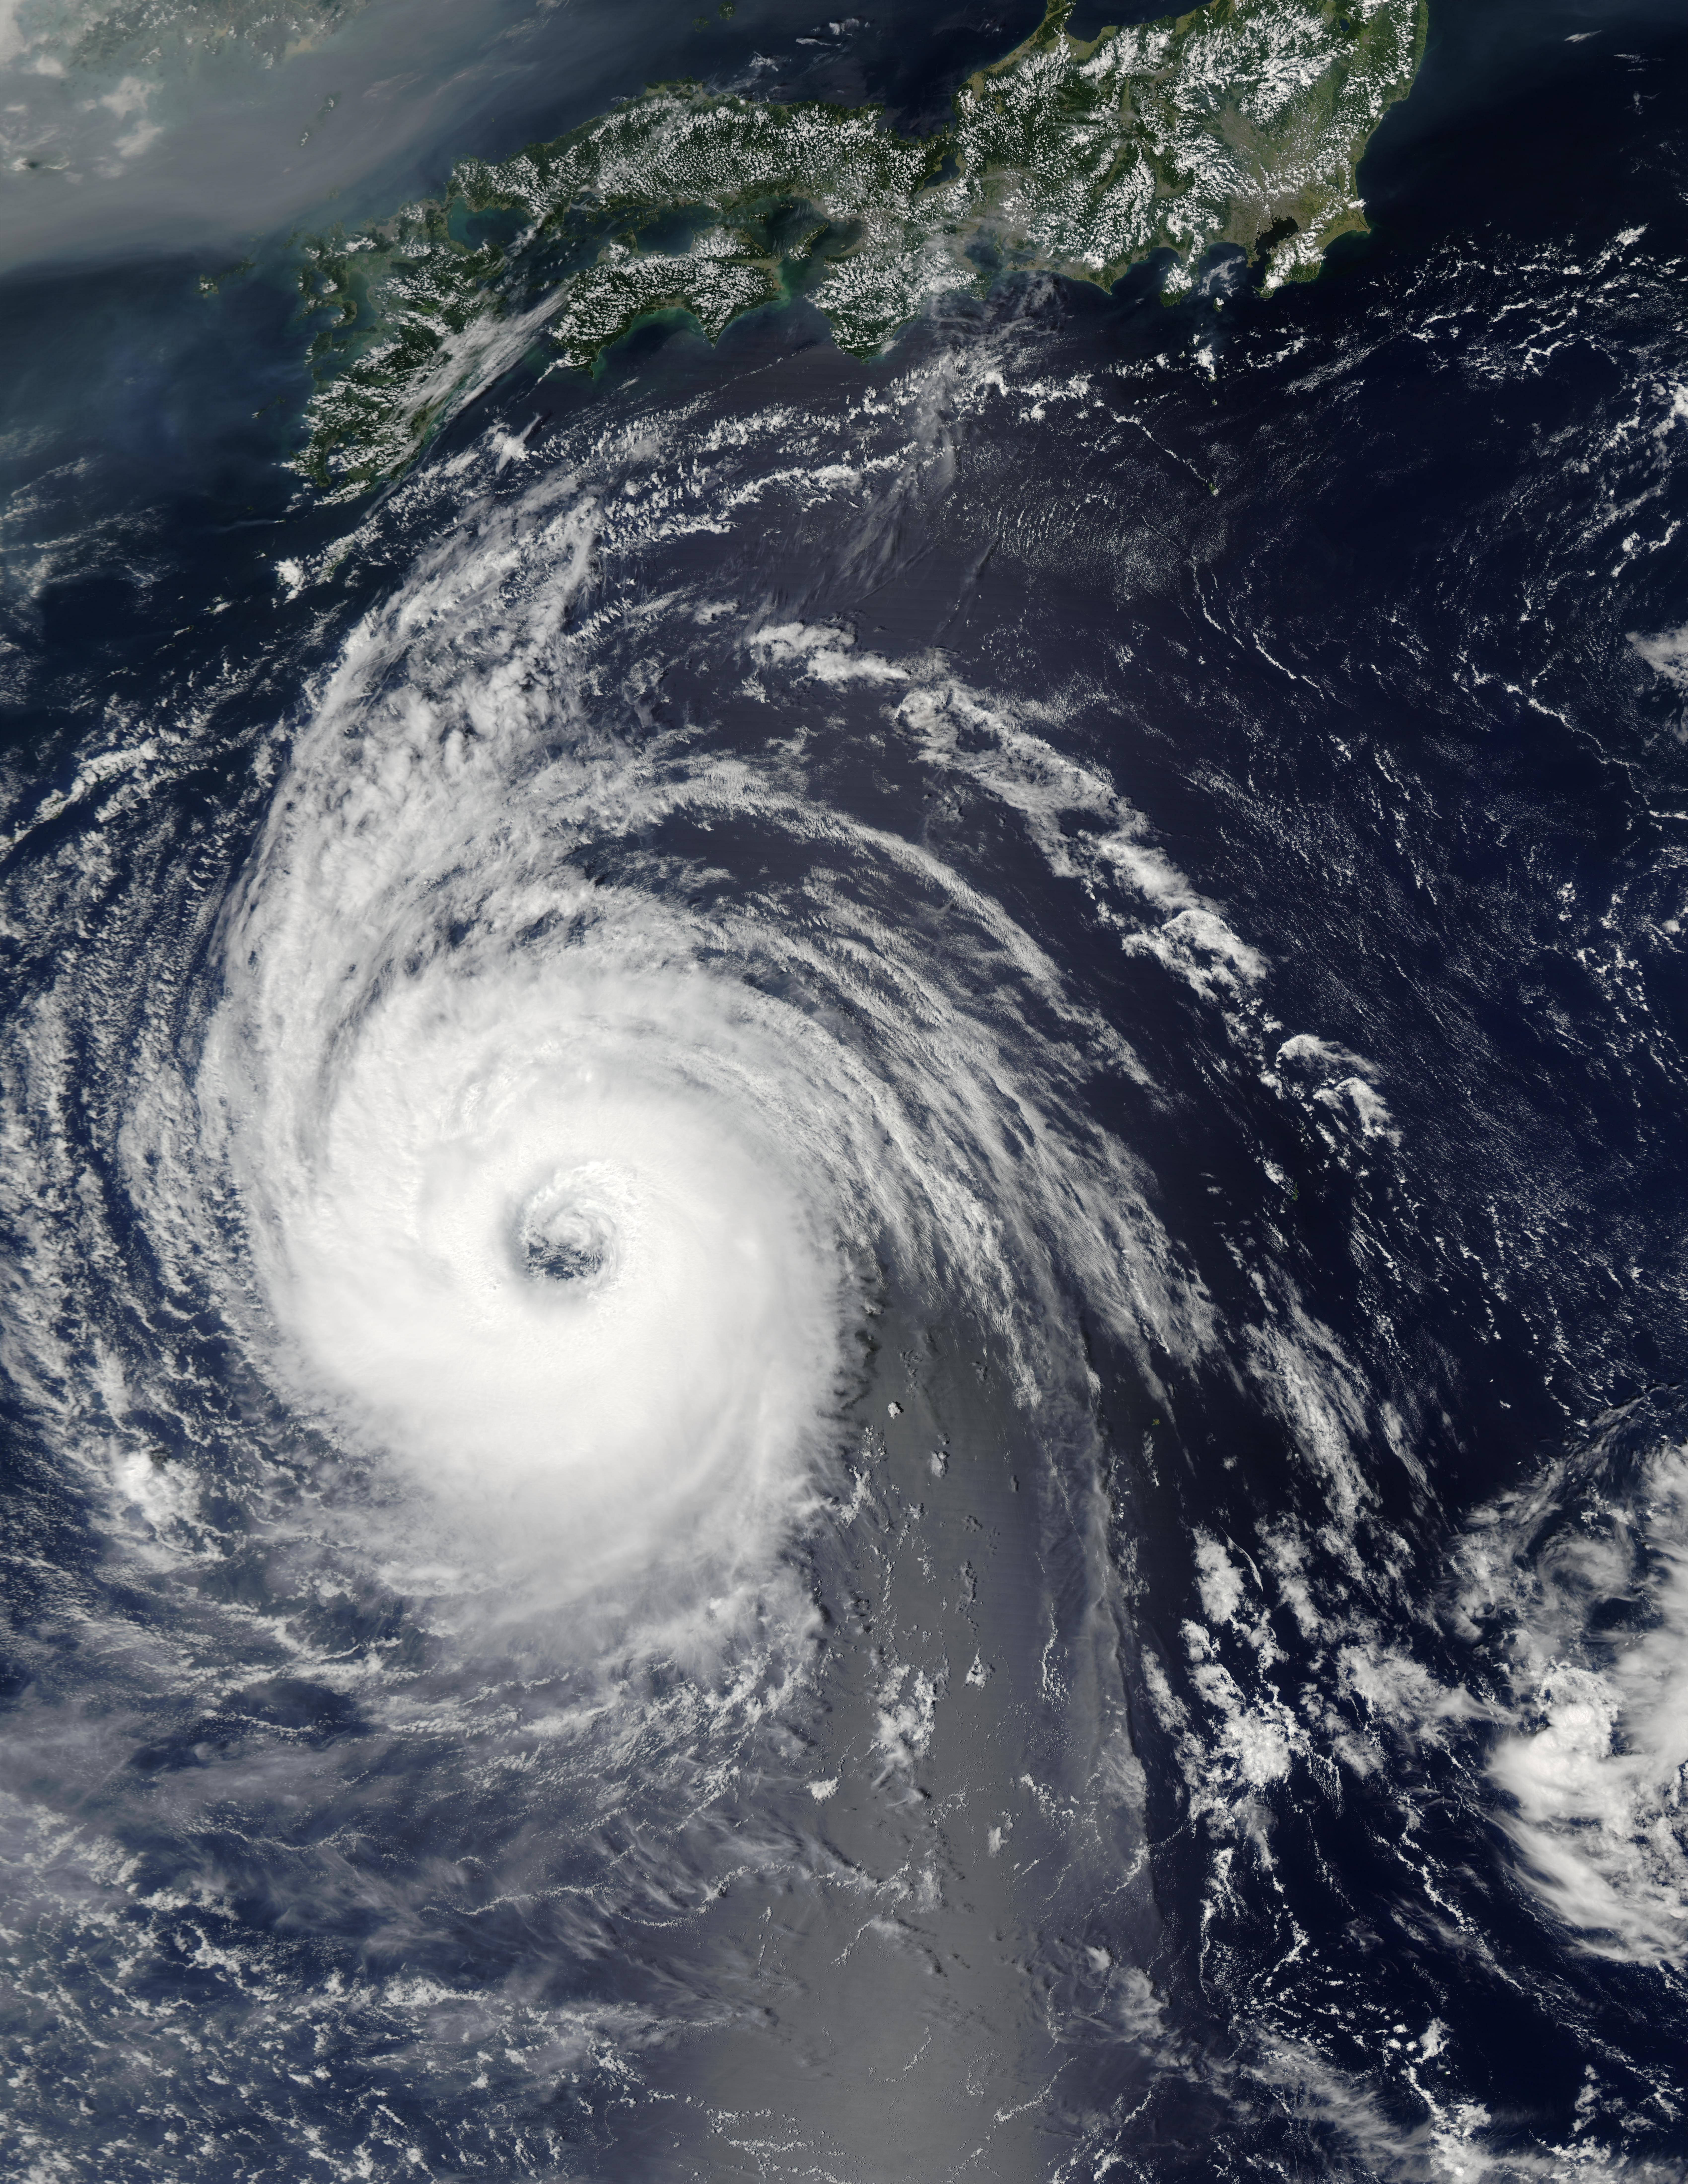 Tifón Sinlaku (22W) sur de Japón